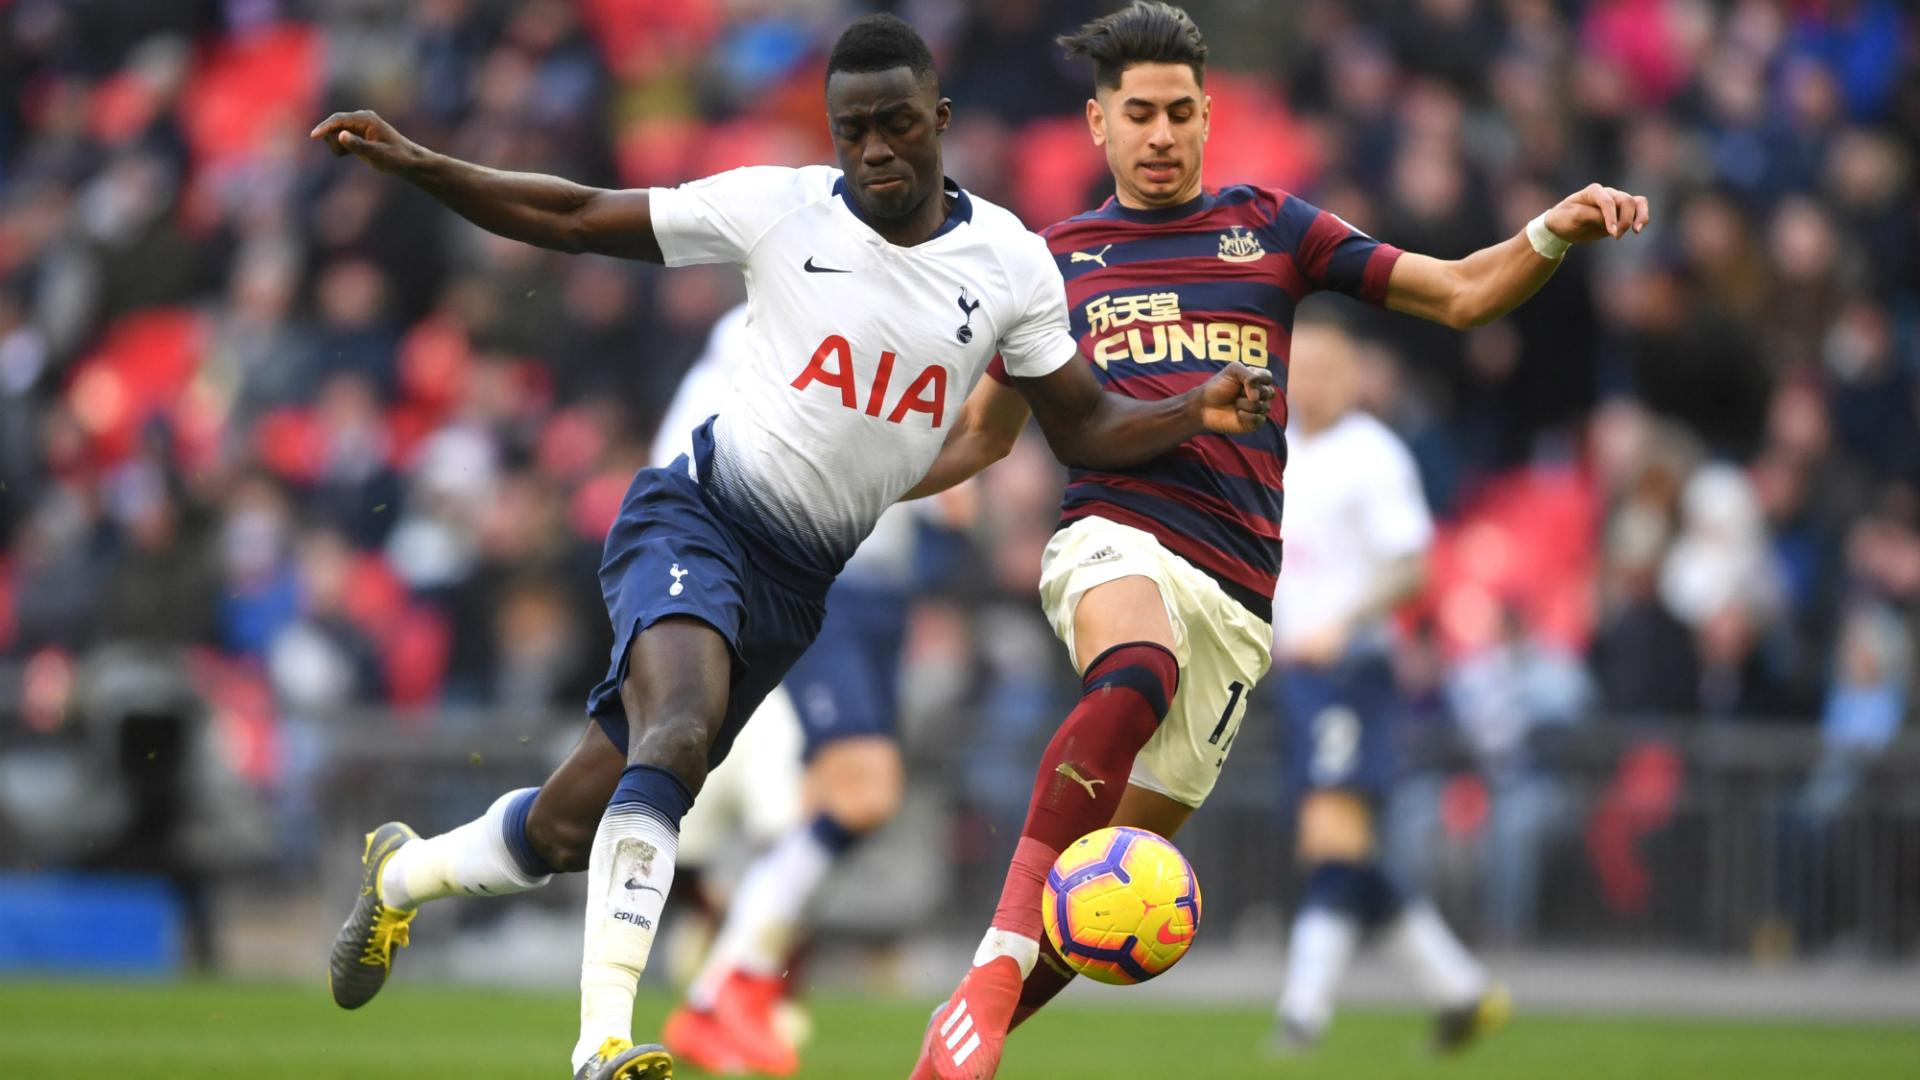 Davinson Sanchez Ayoze Perez Tottenham Hotspur - Newcastle United 02022019